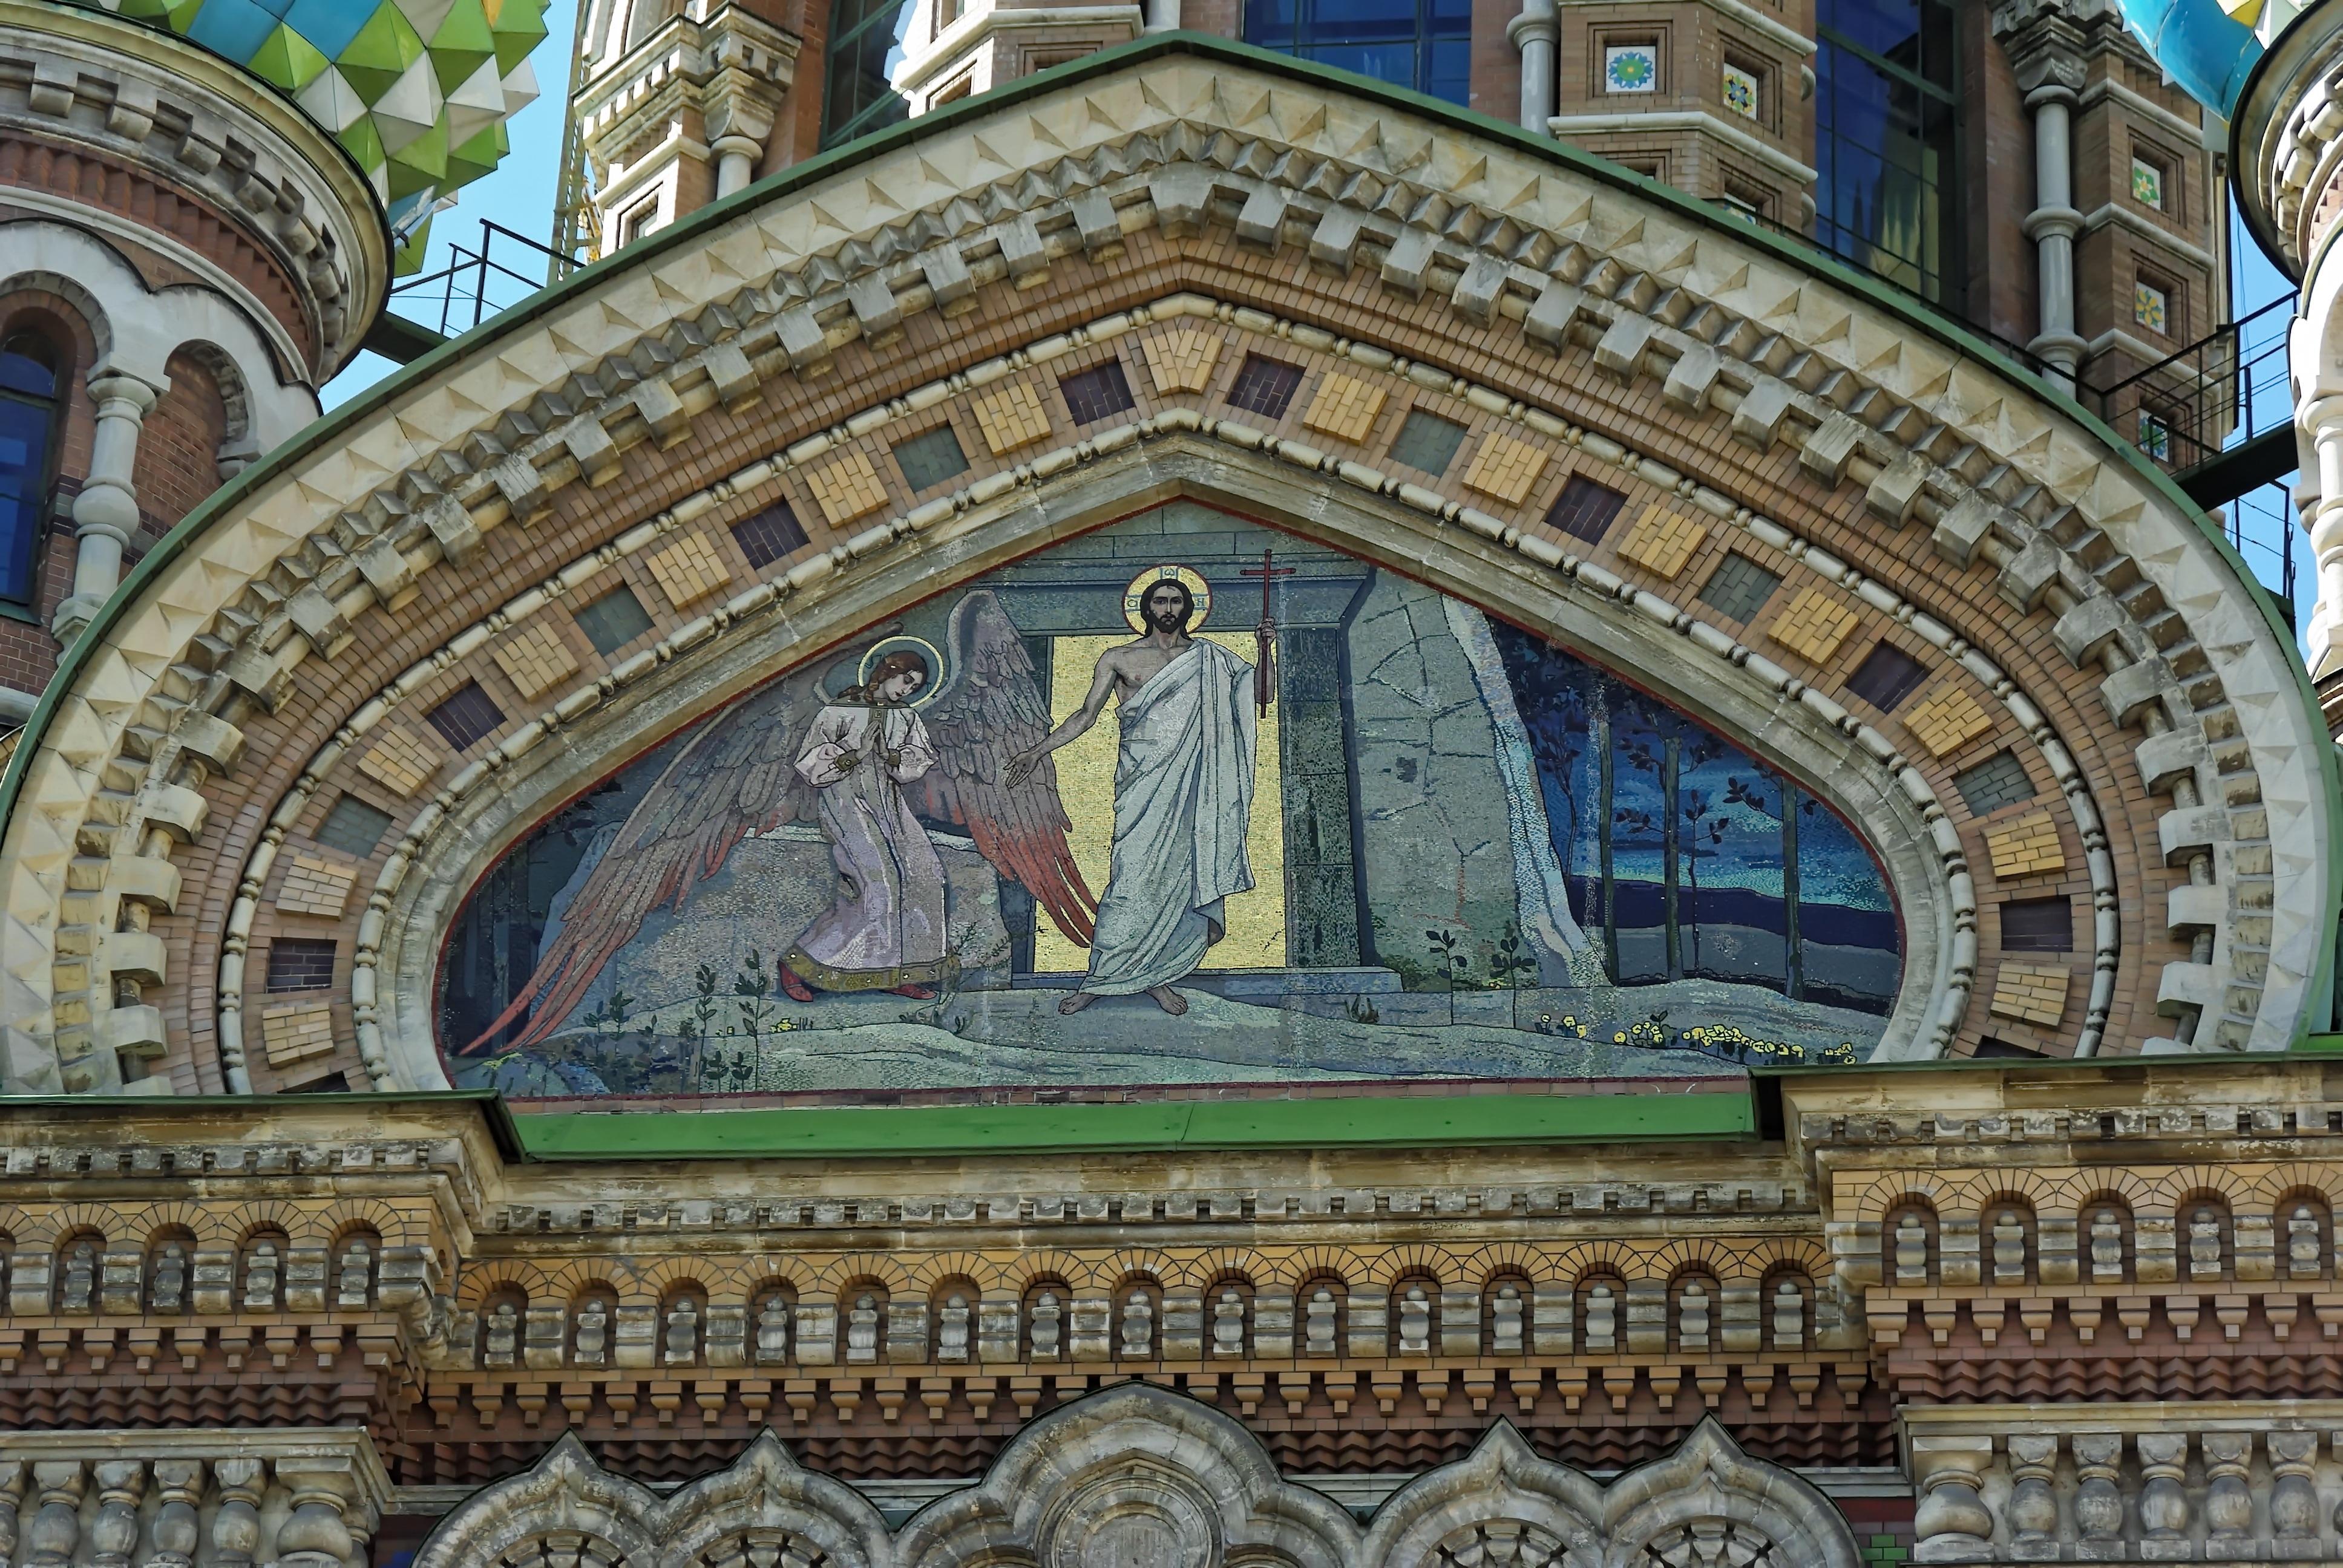 Roman Architecture Dome free images : window, building, palace, arch, decoration, landmark